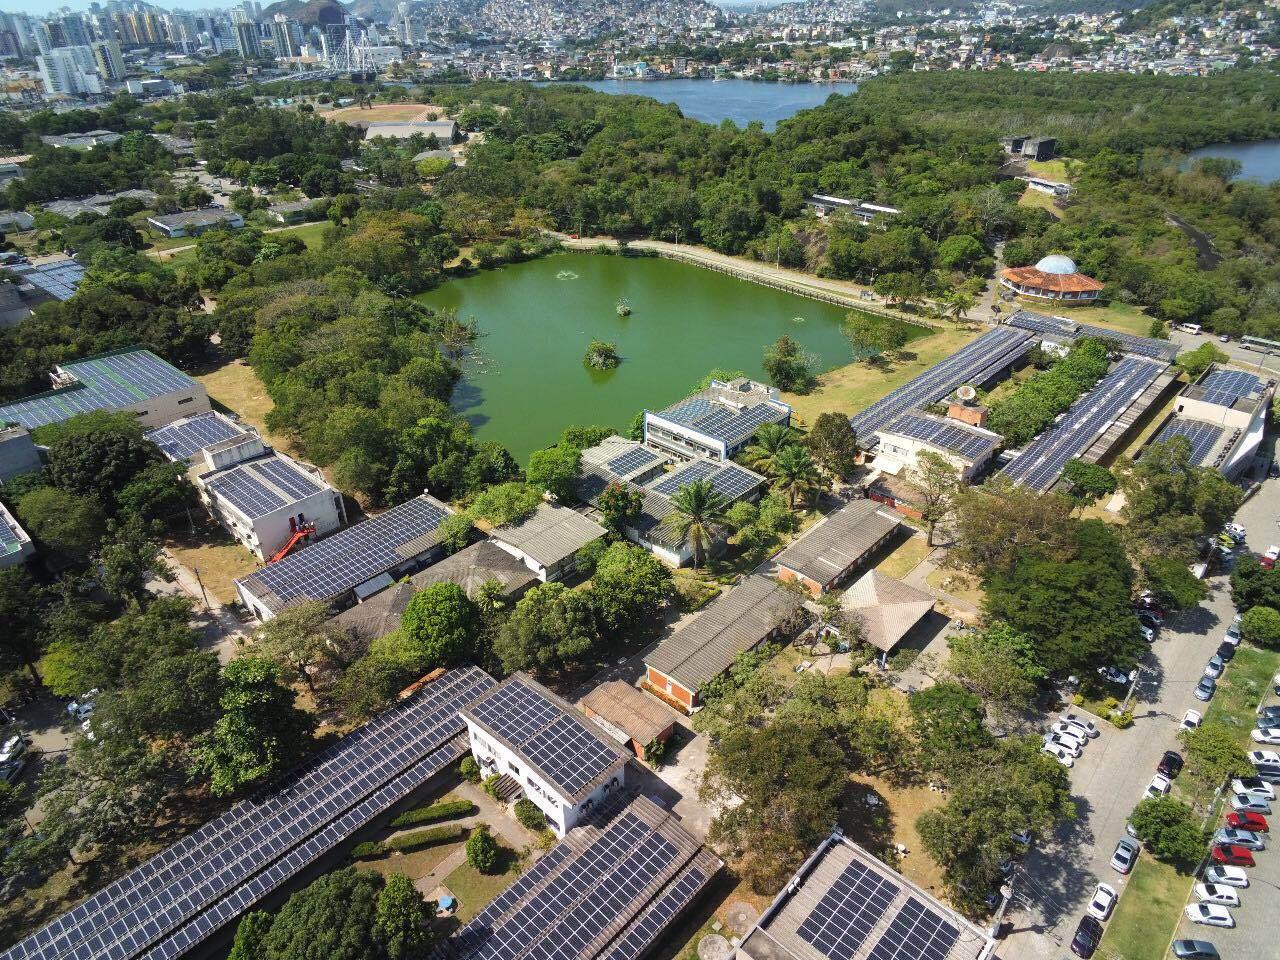 largest PV power plant project in Brazil's Espirito Santo